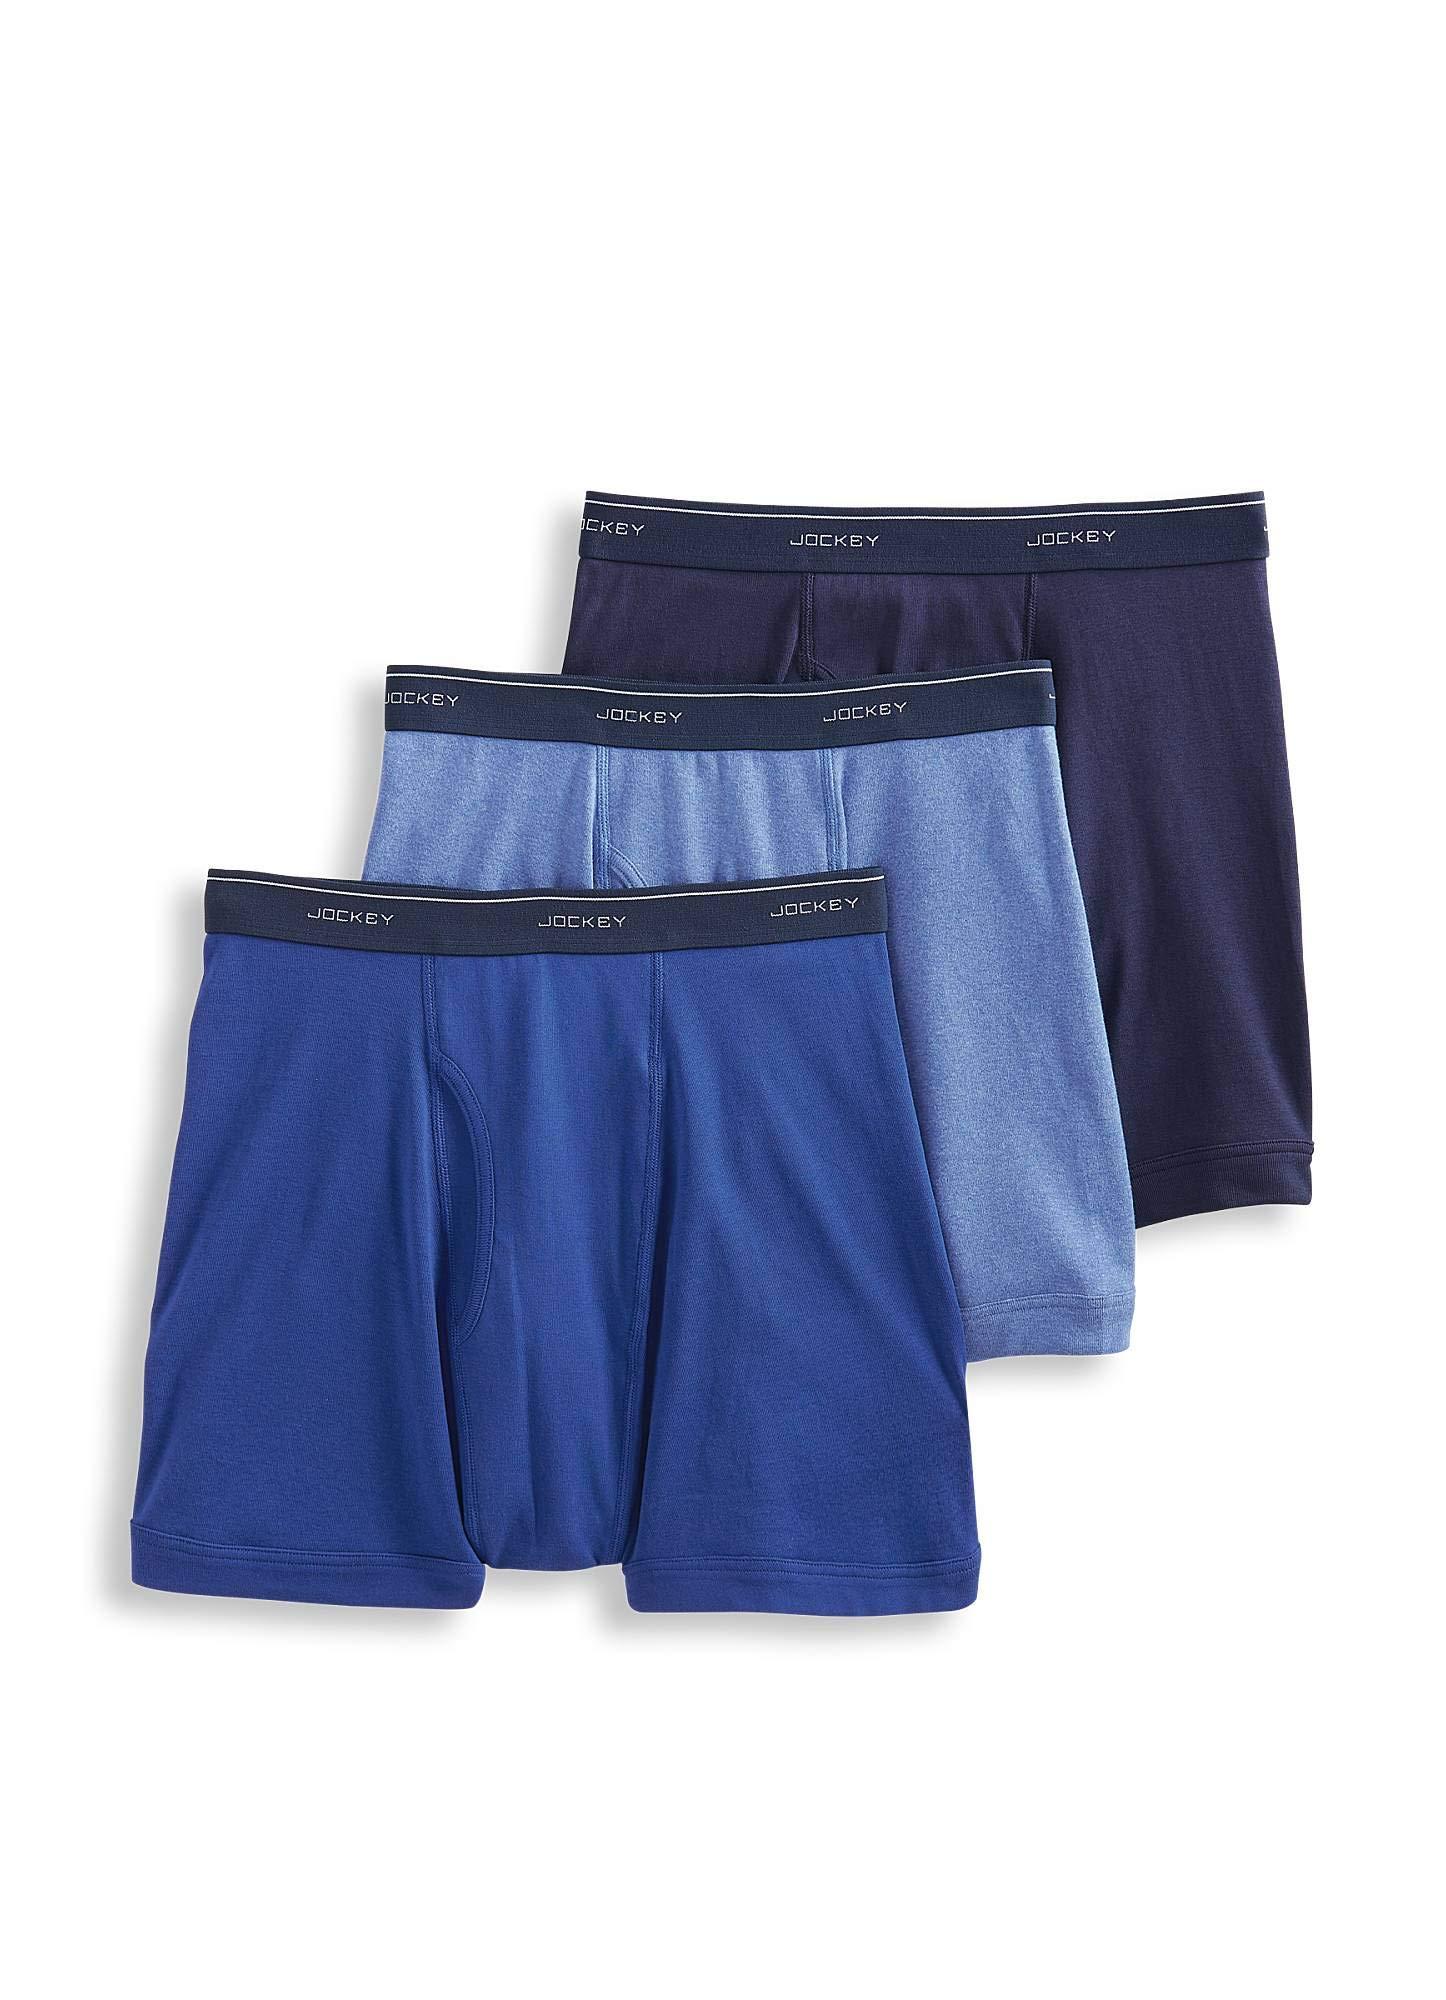 Jockey Men's Underwear Classic Boxer Brief - 3 Pack, Riverrock Blue/Space Blue/Cool Waters Heather, 2XL